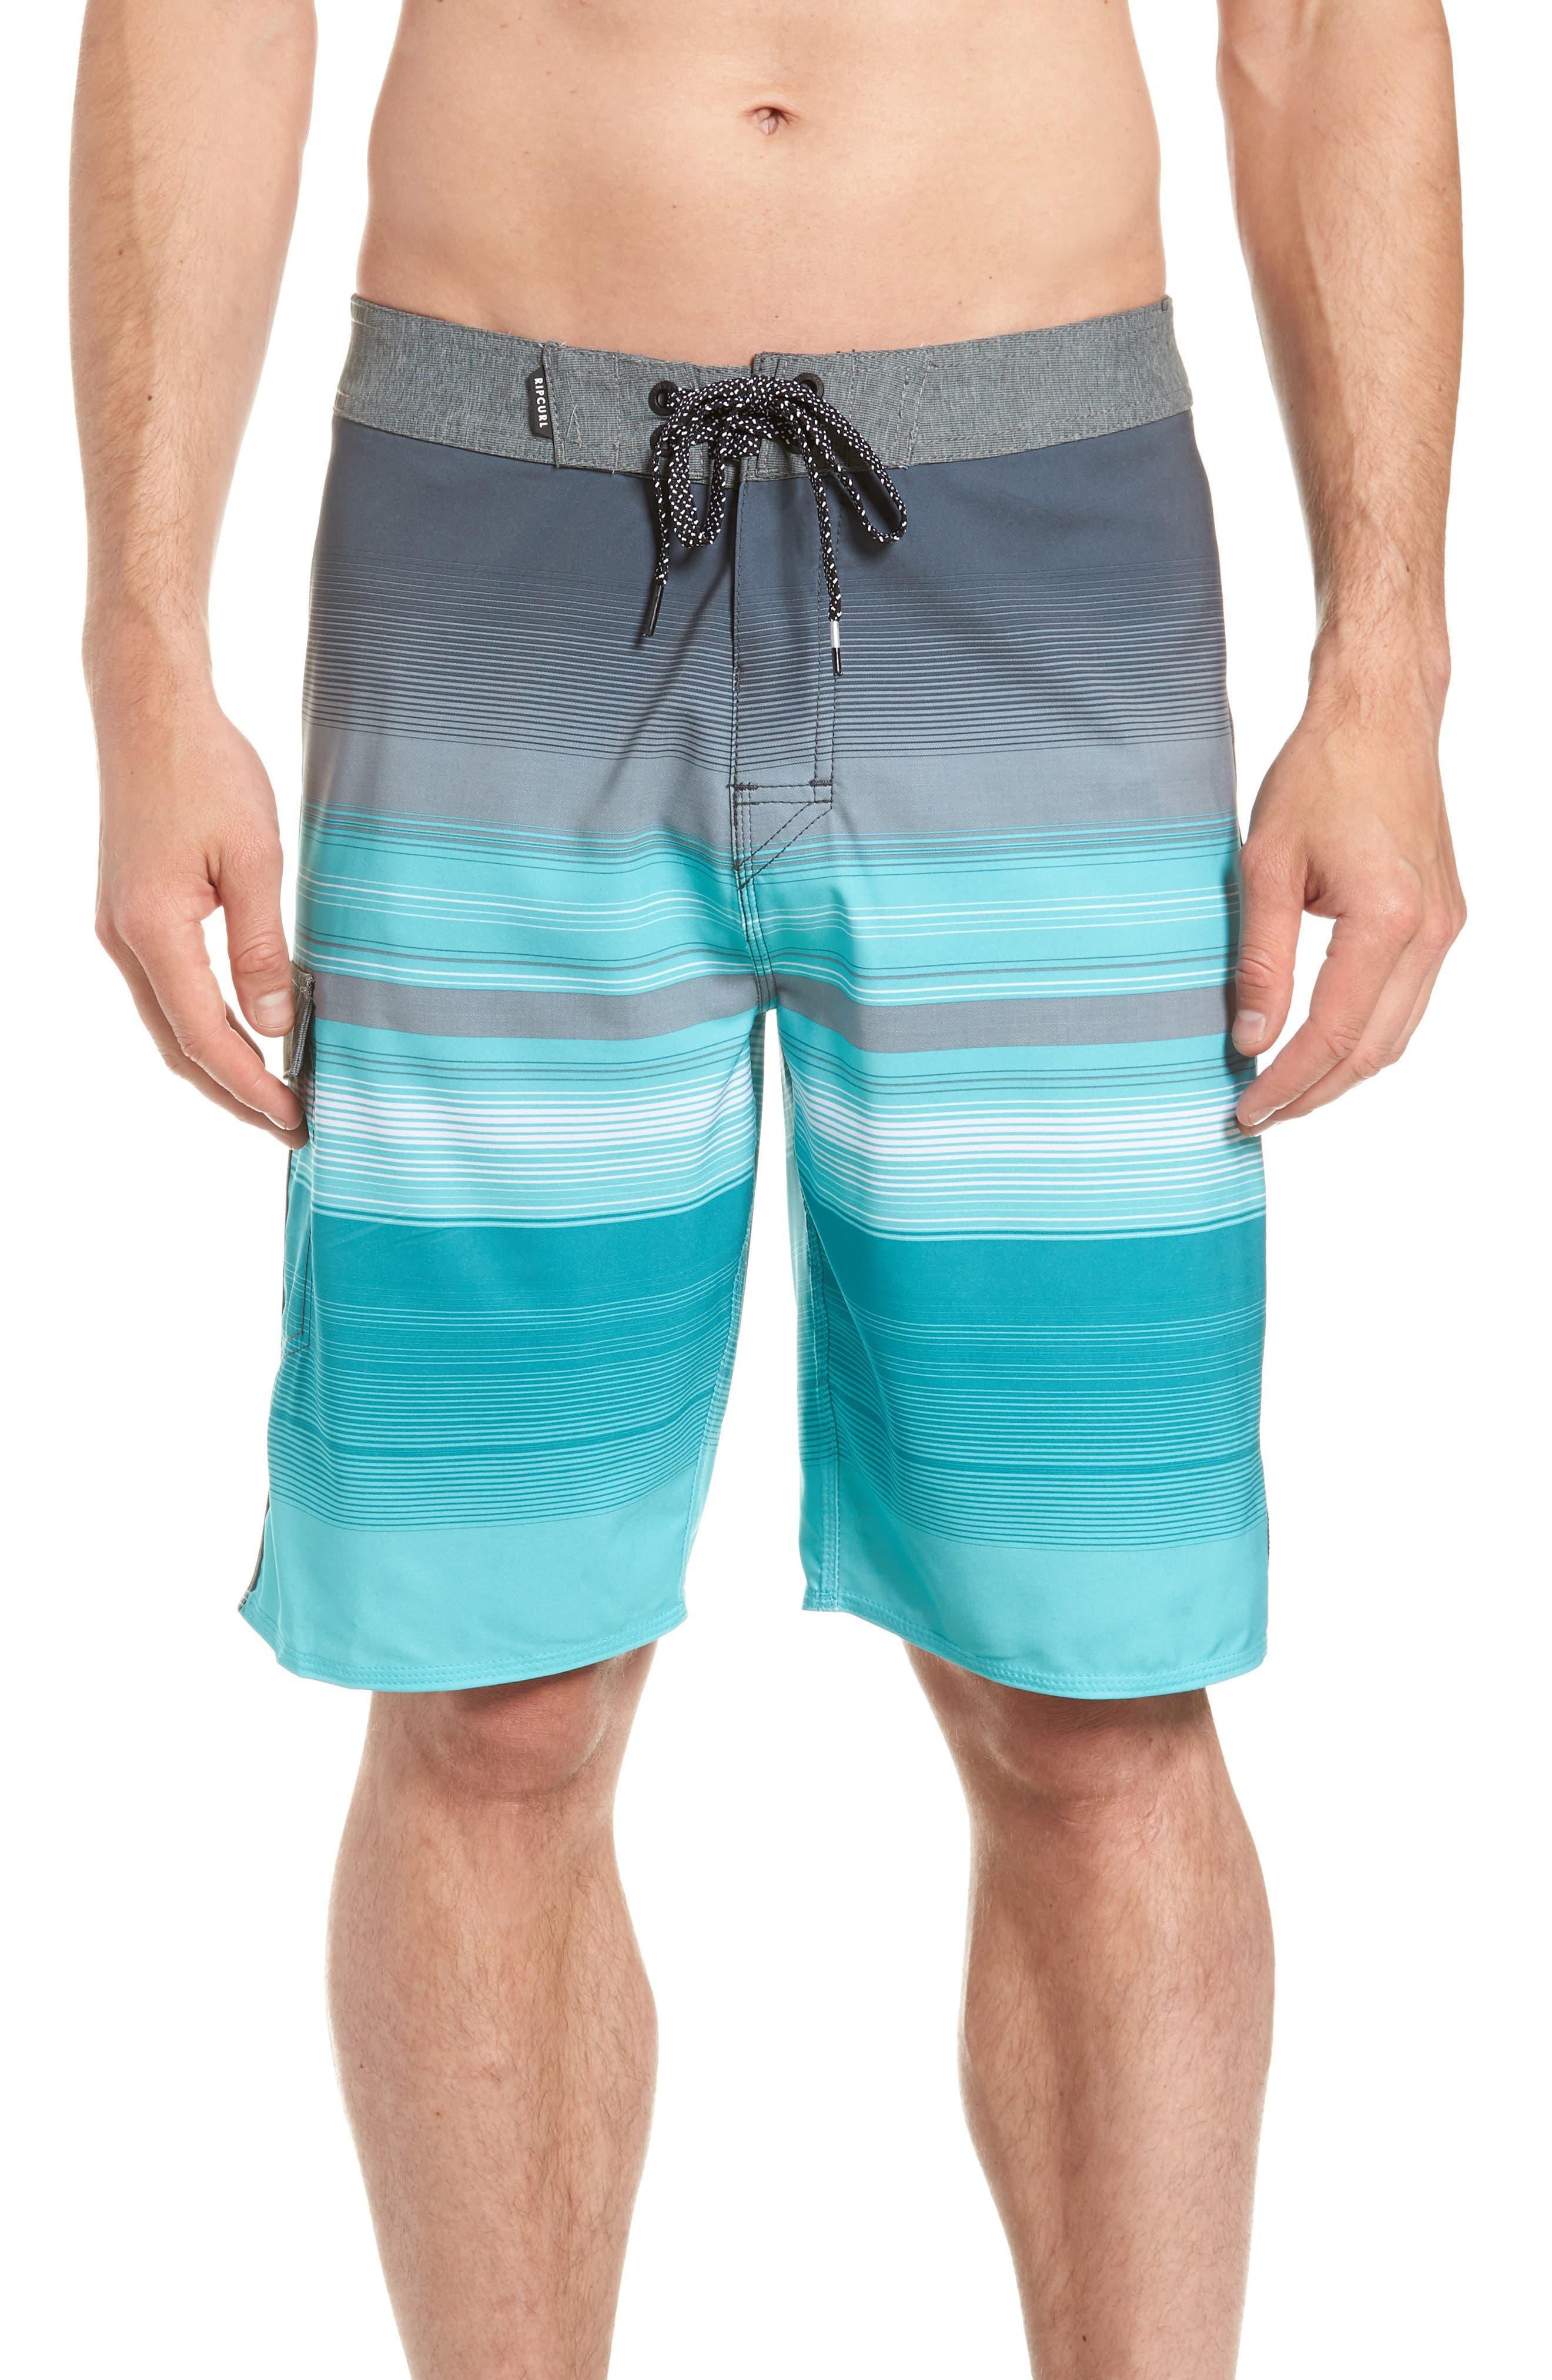 Mirage Accelerate Board Shorts,                             Main thumbnail 1, color,